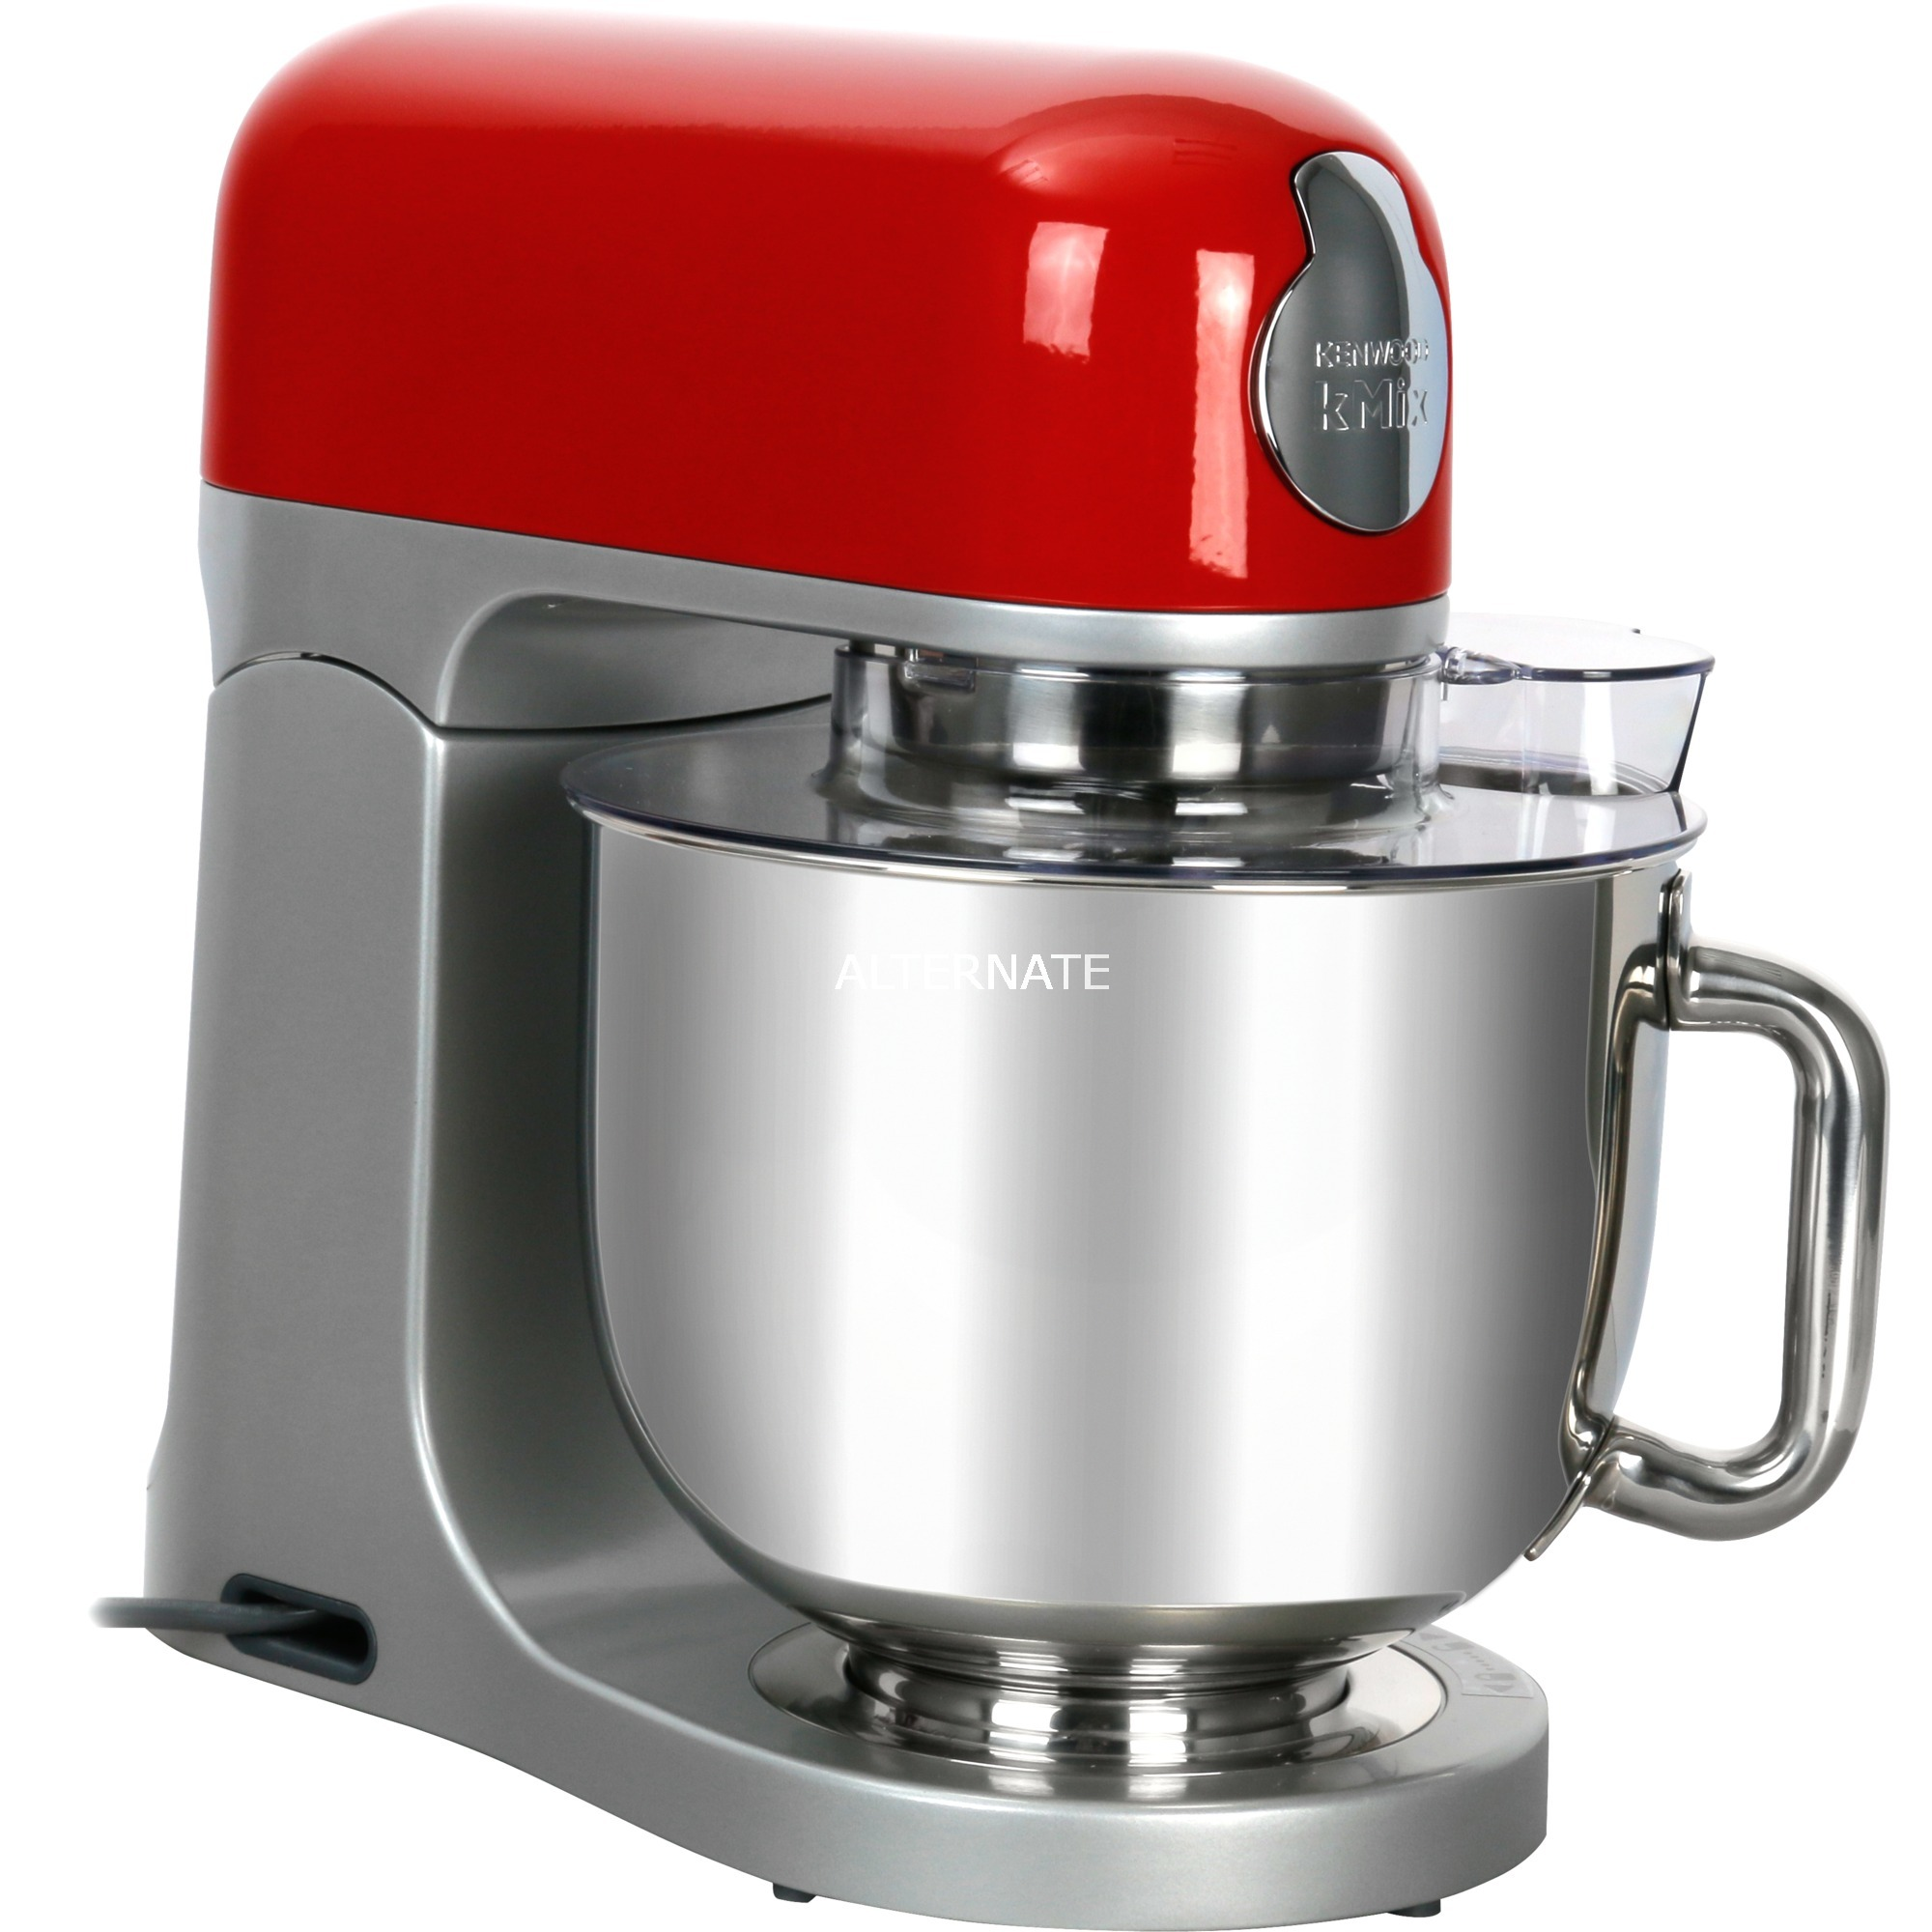 0W20011138 robot de cocina 5 L Rojo 1000 W